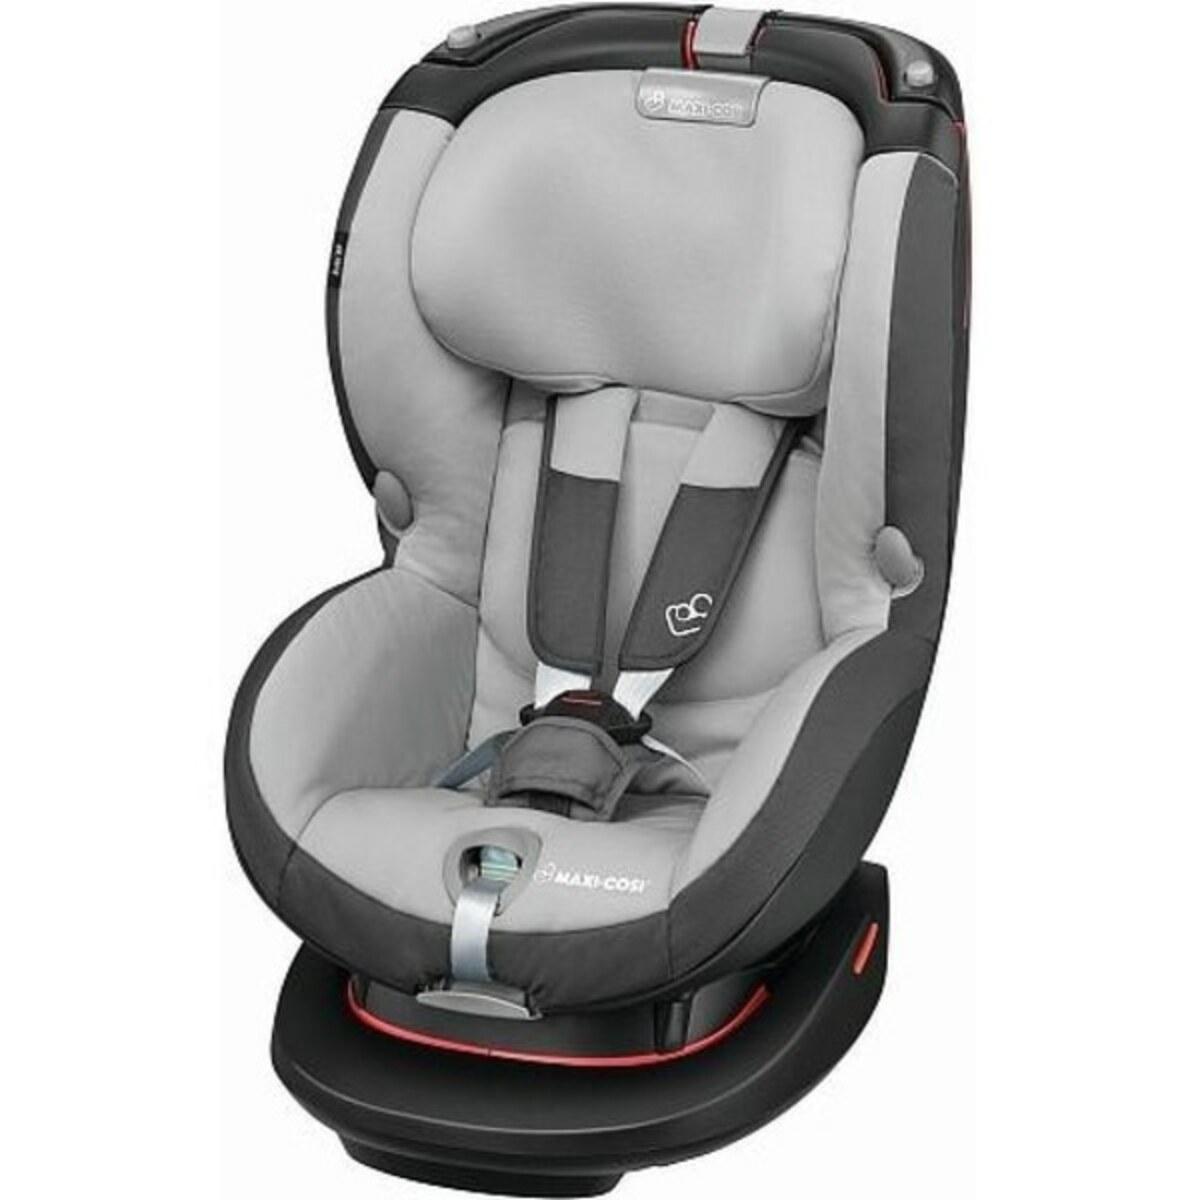 Bild 1 von Maxi-Cosi - Kindersitz Rubi XP, Dawn Grey